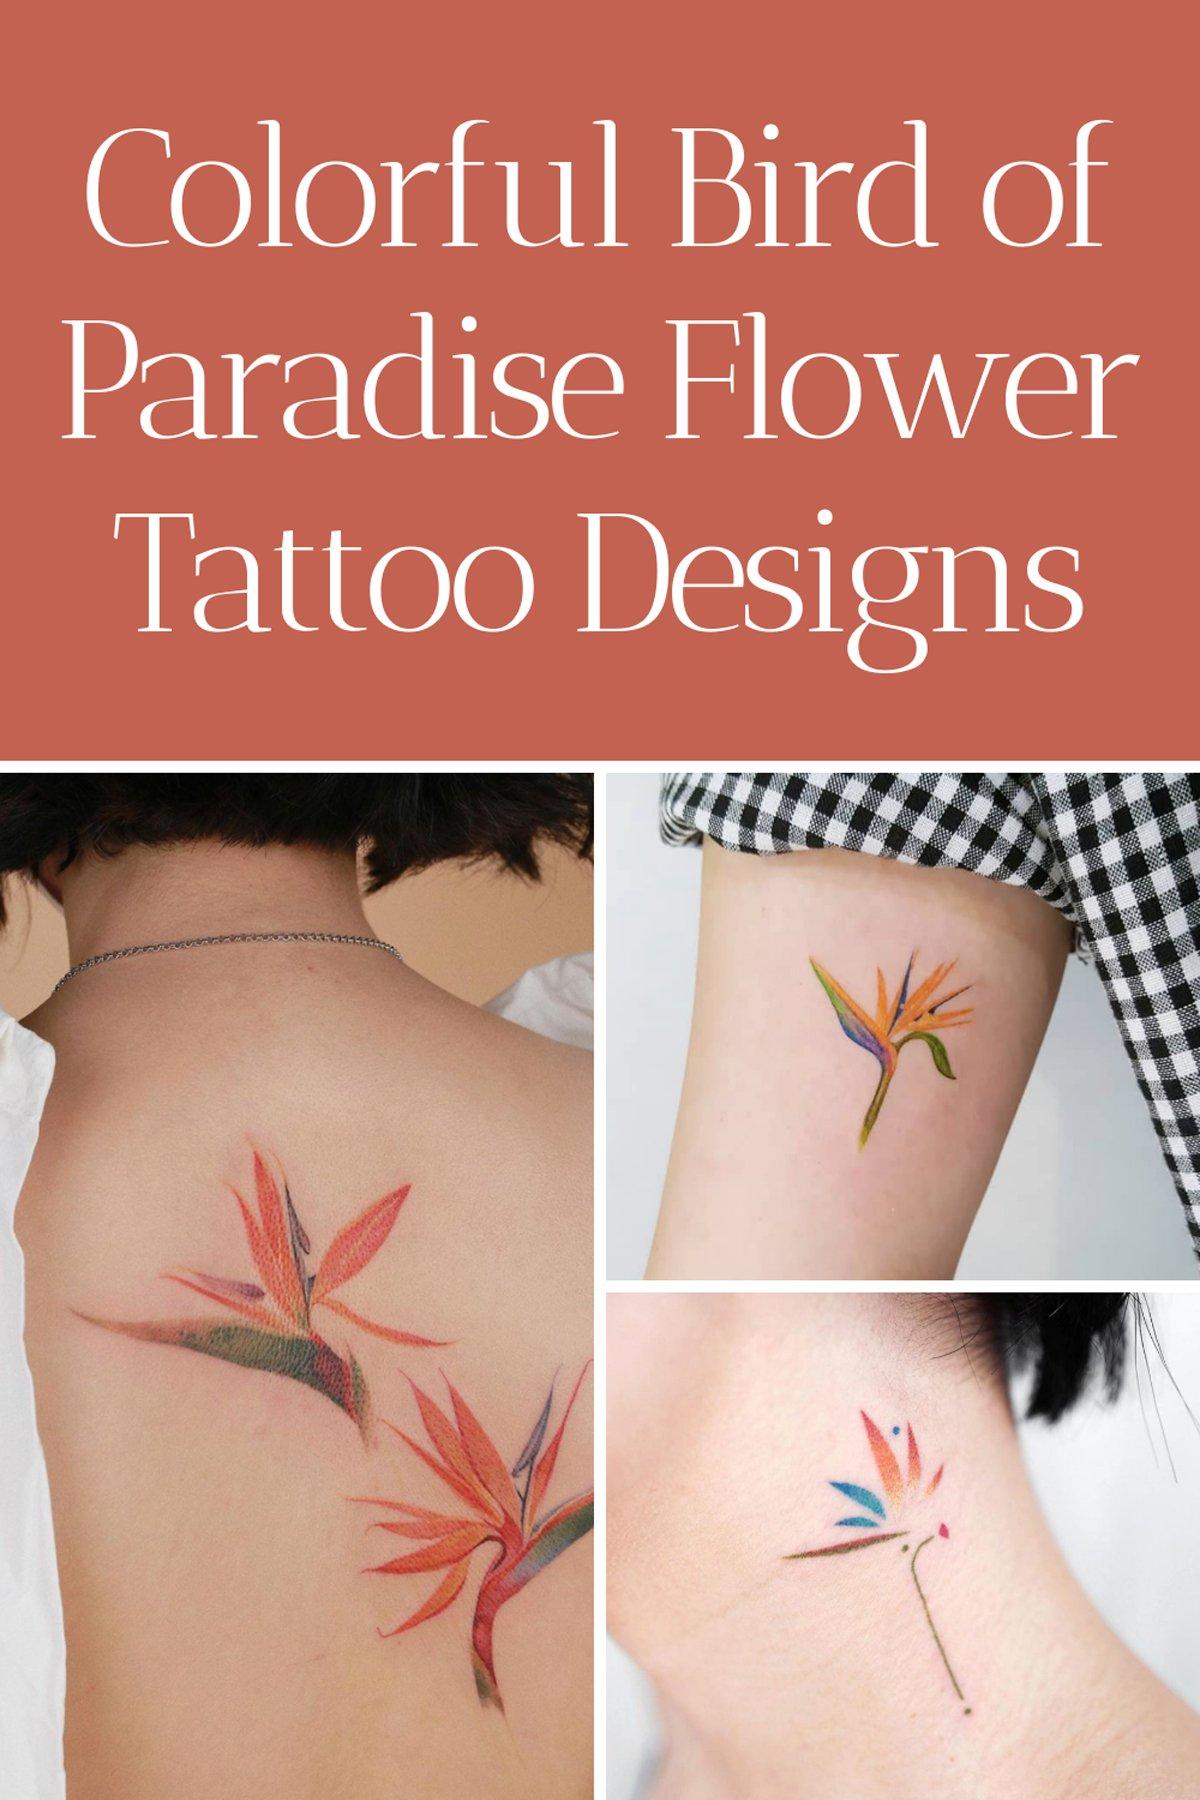 Bird of Paradise Flower Tattoo